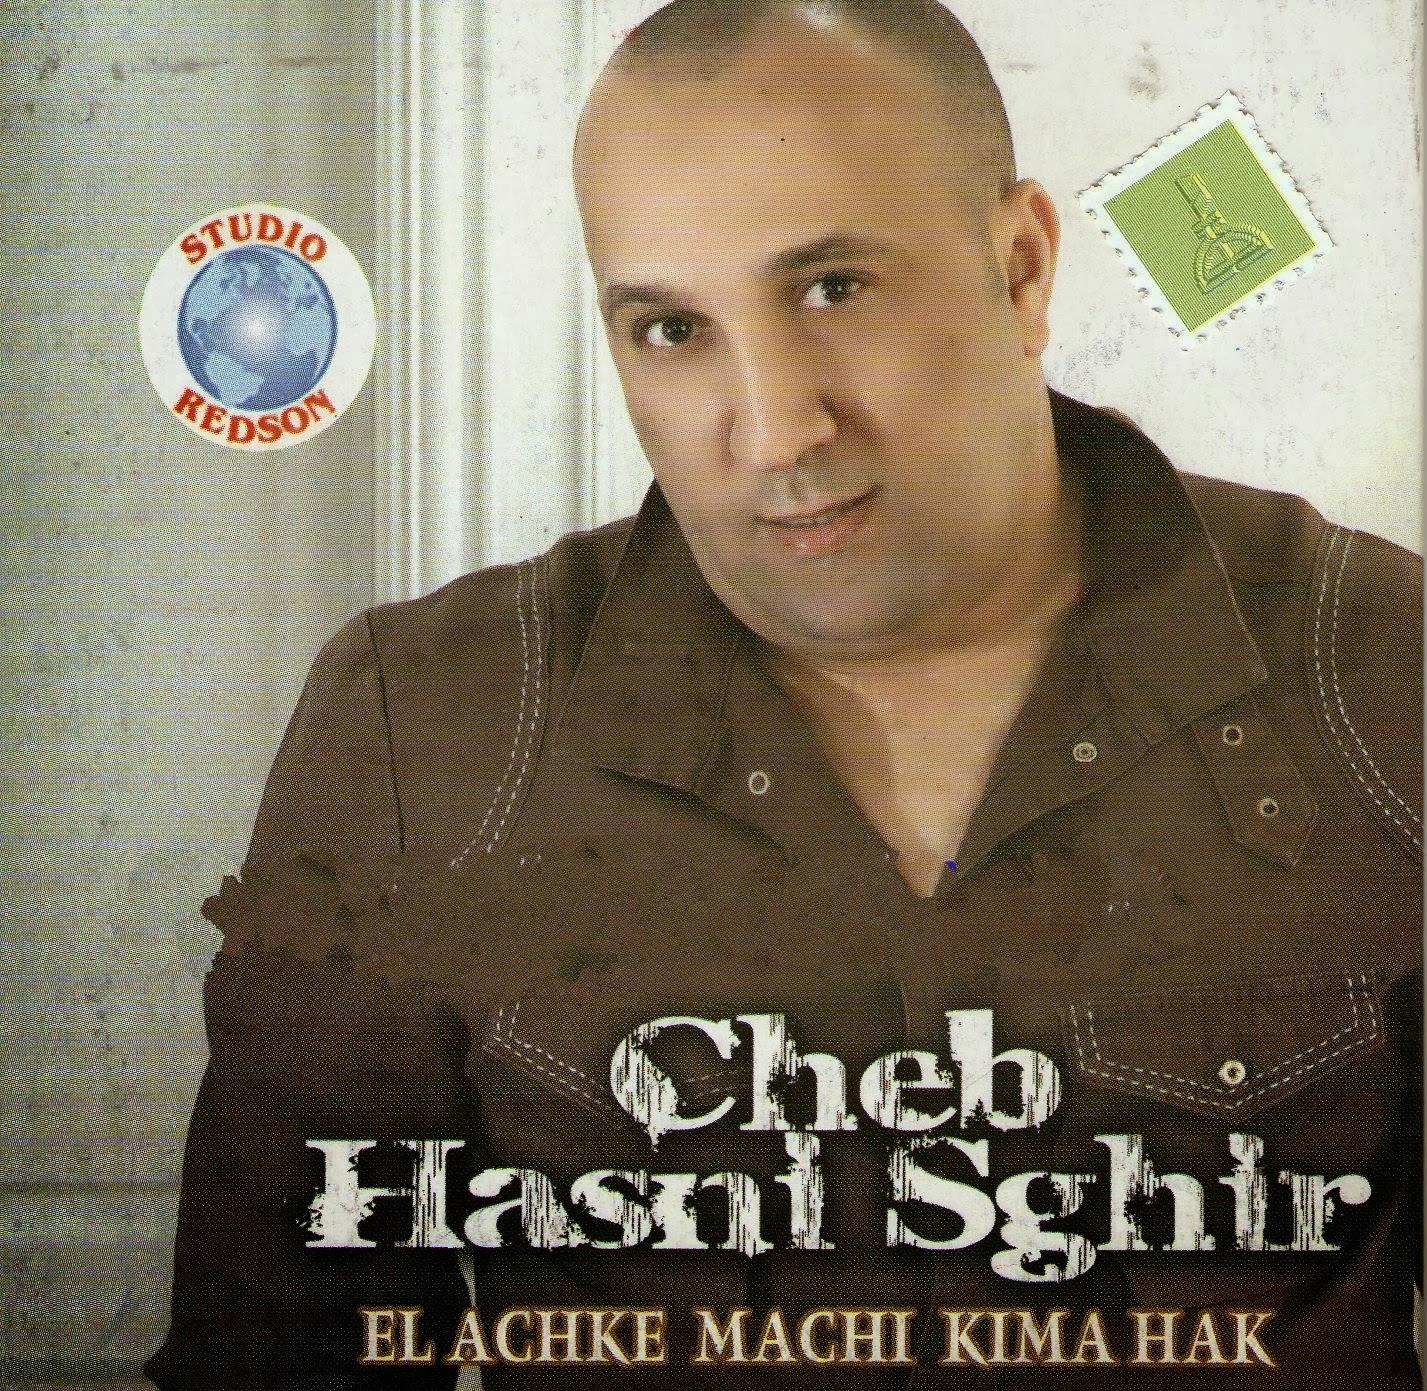 Hasni Sghir-El Achke Machi Kima Hak